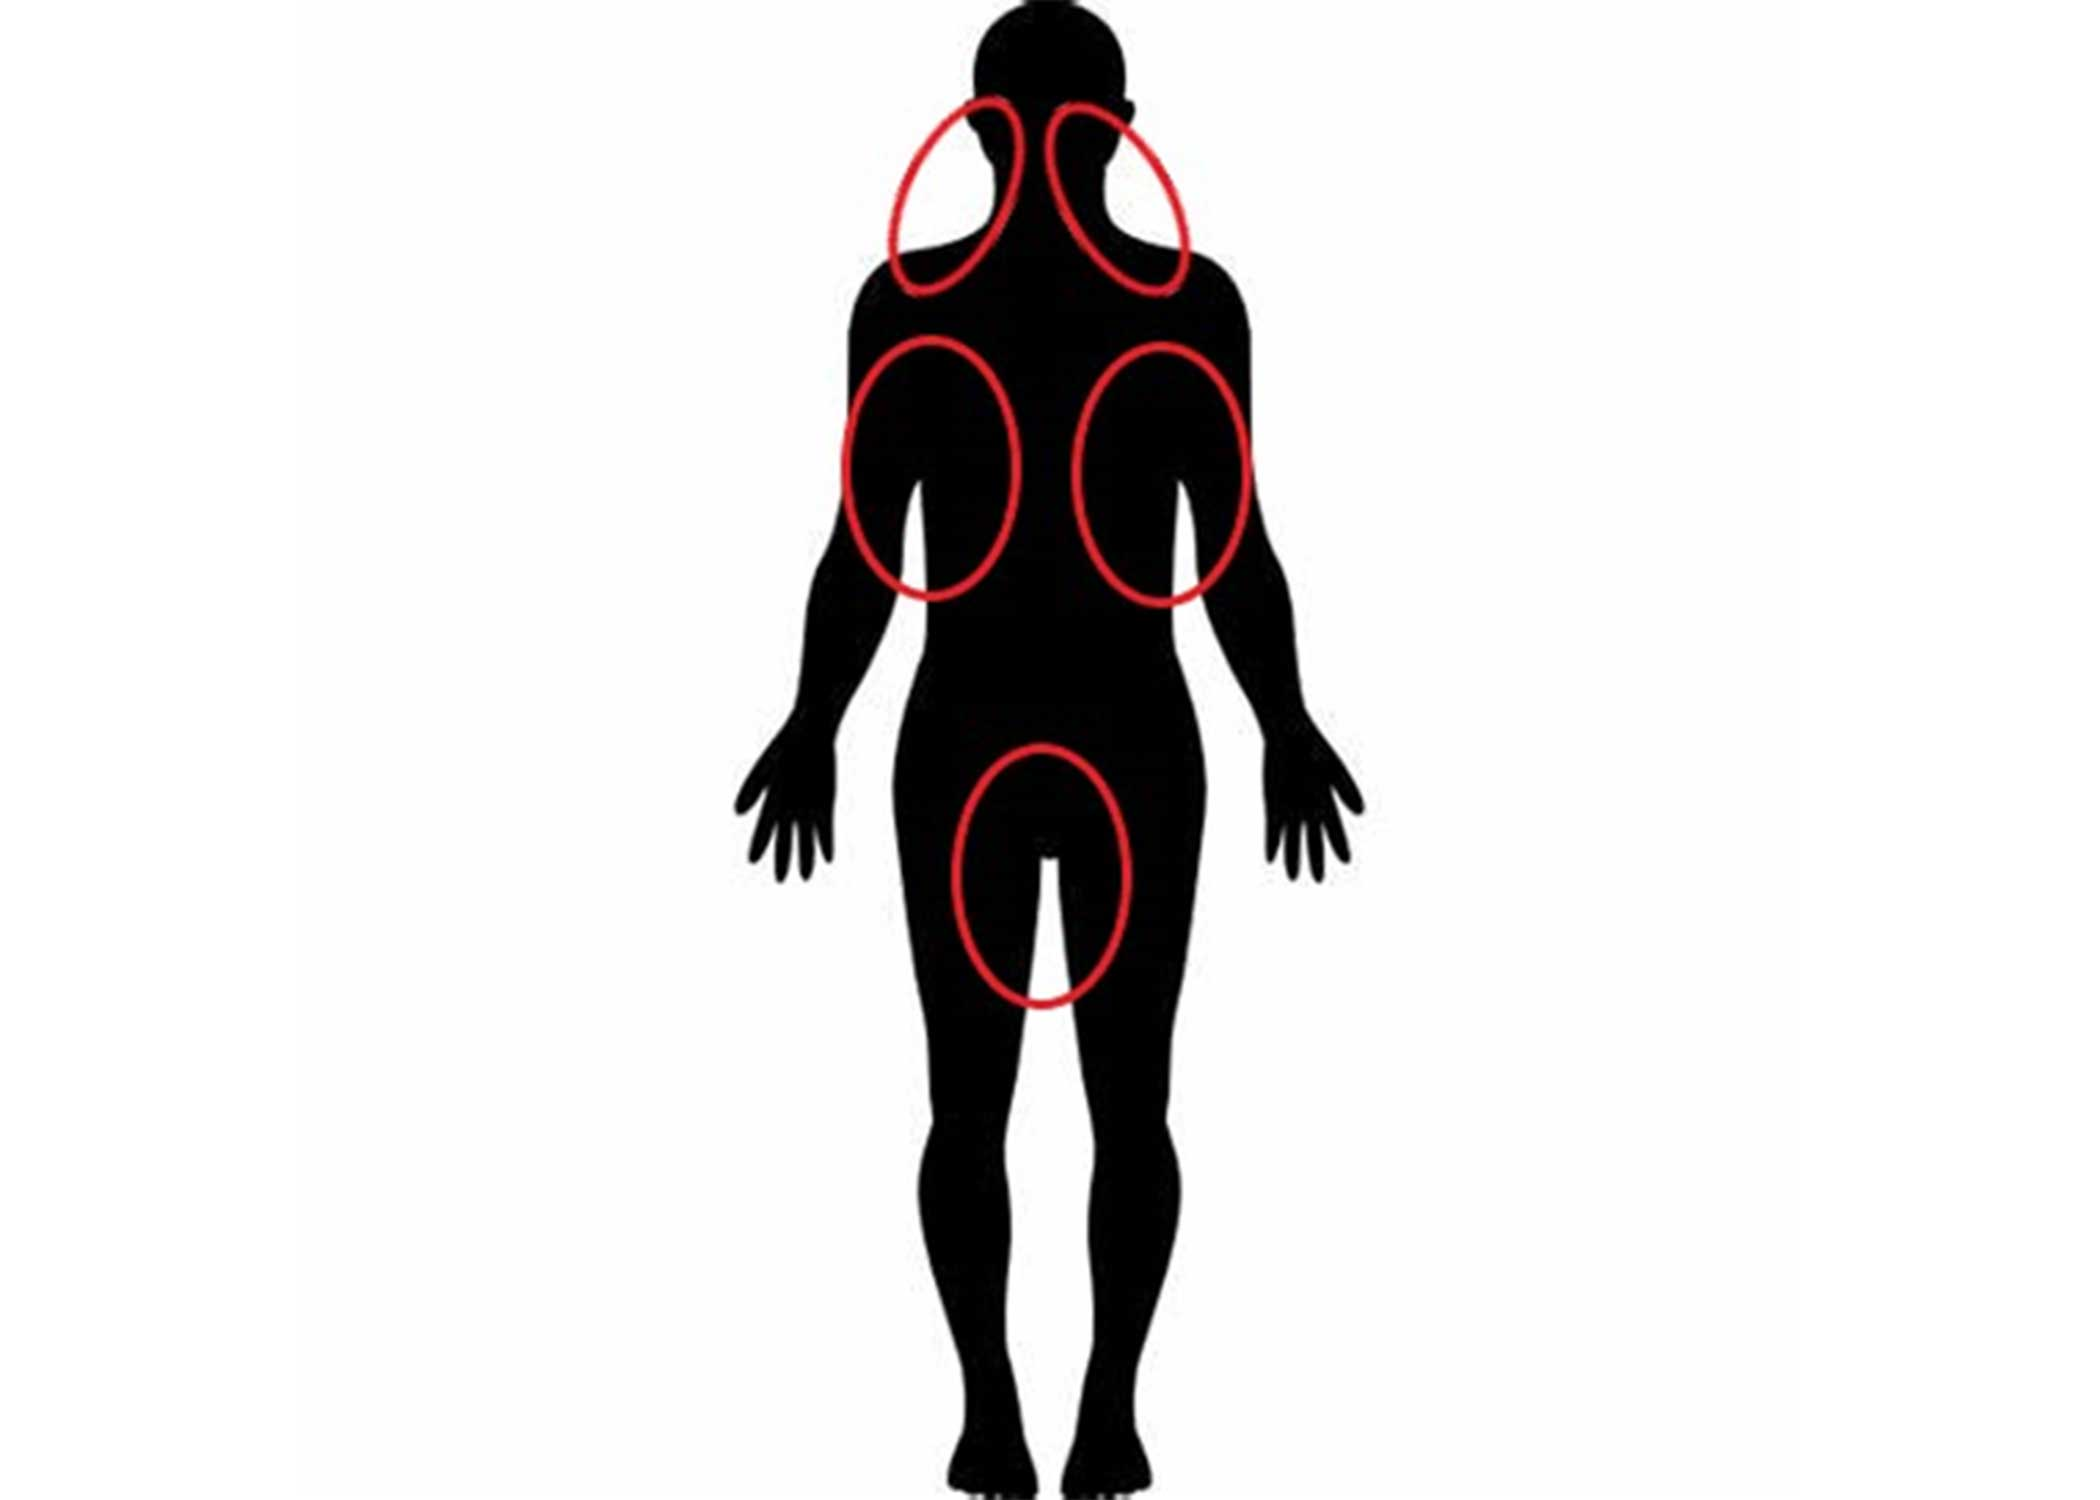 Human Silhouette Diagram